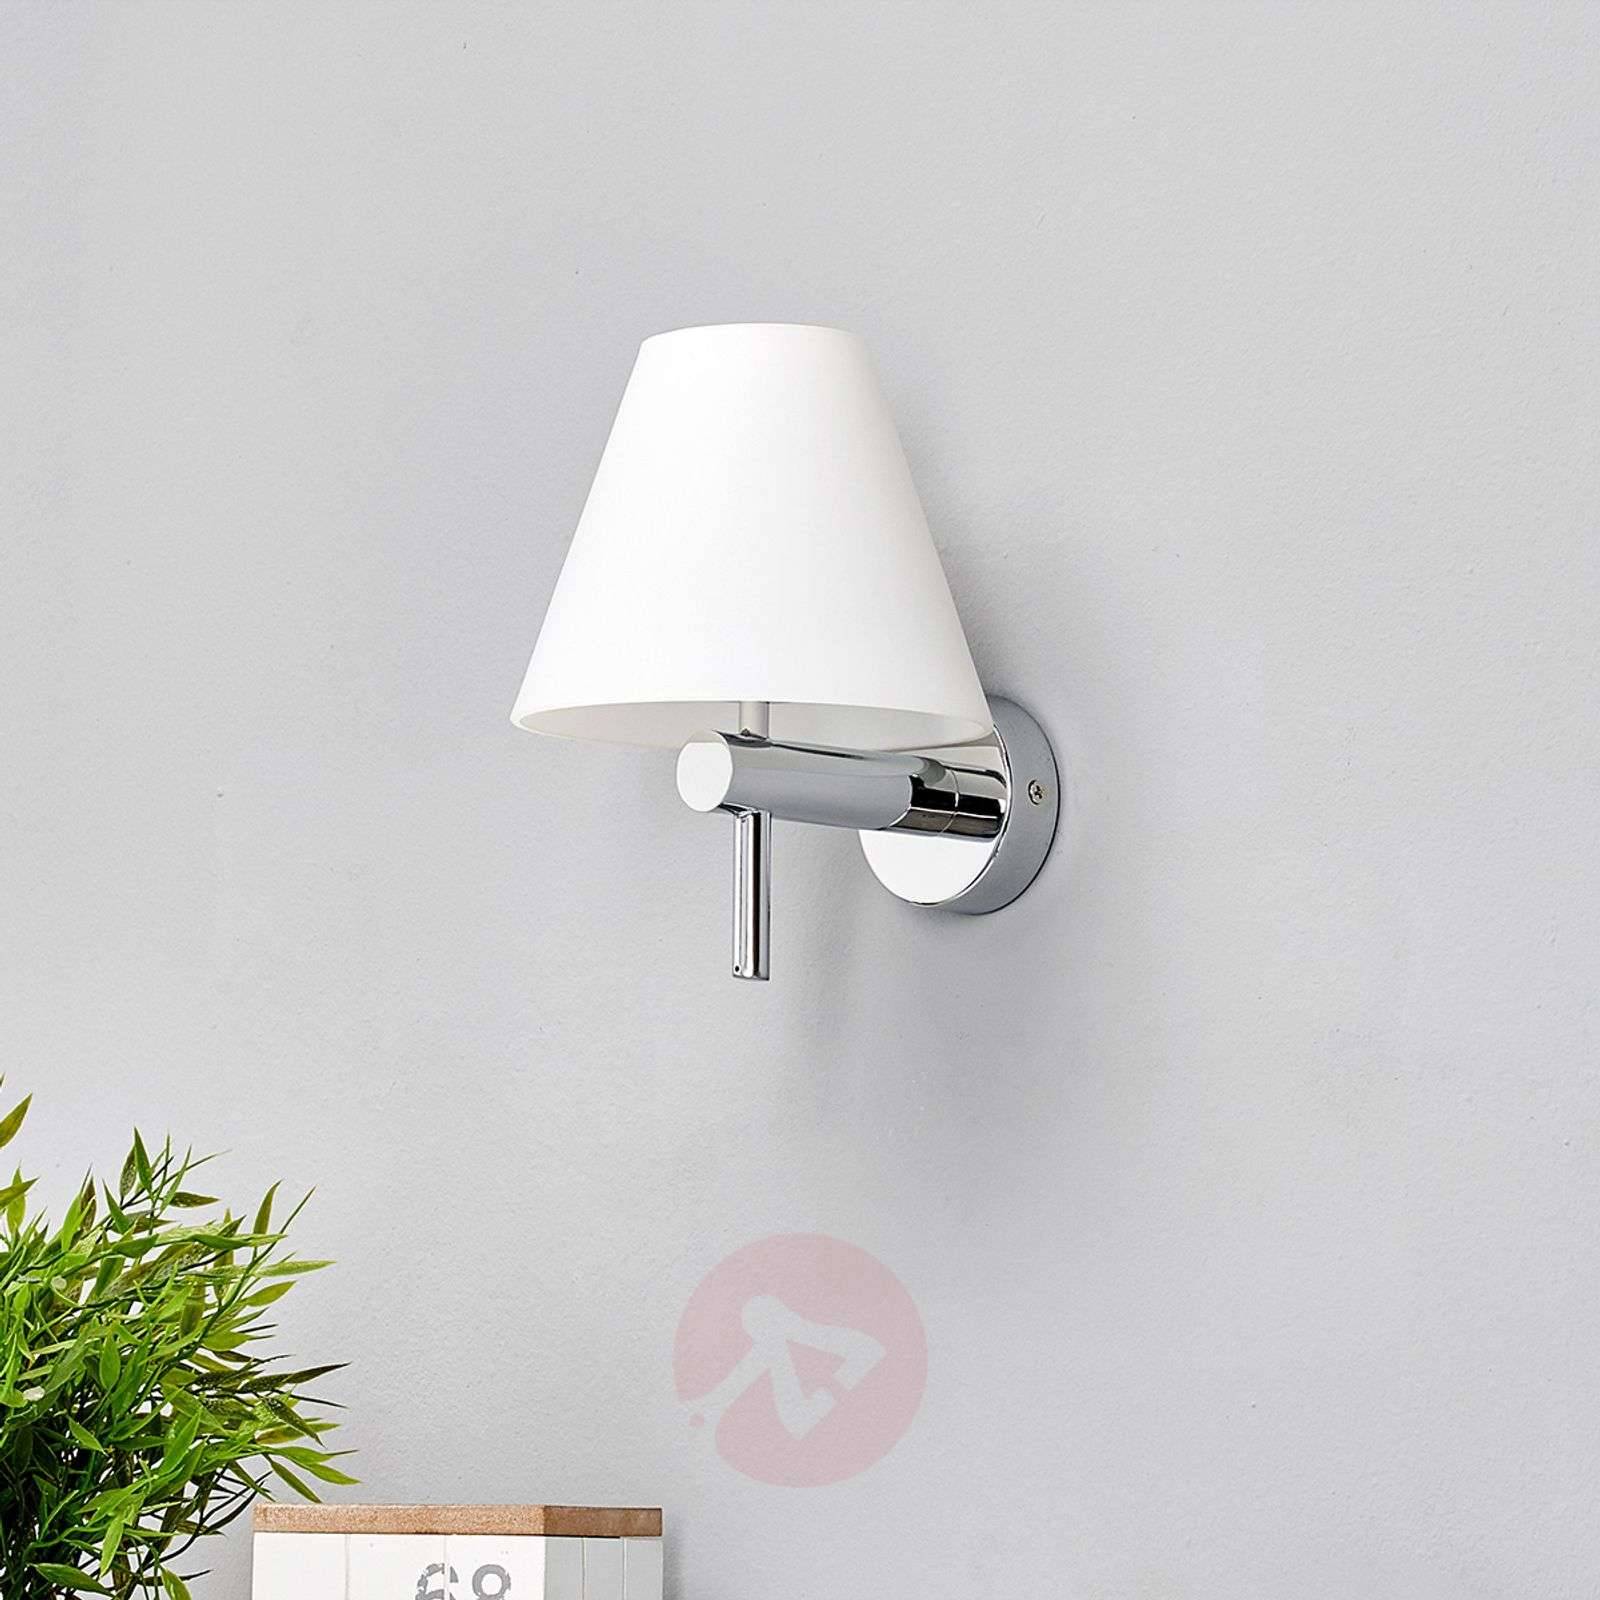 Violetta Bathroom Wall Light Elegant-9641007-01